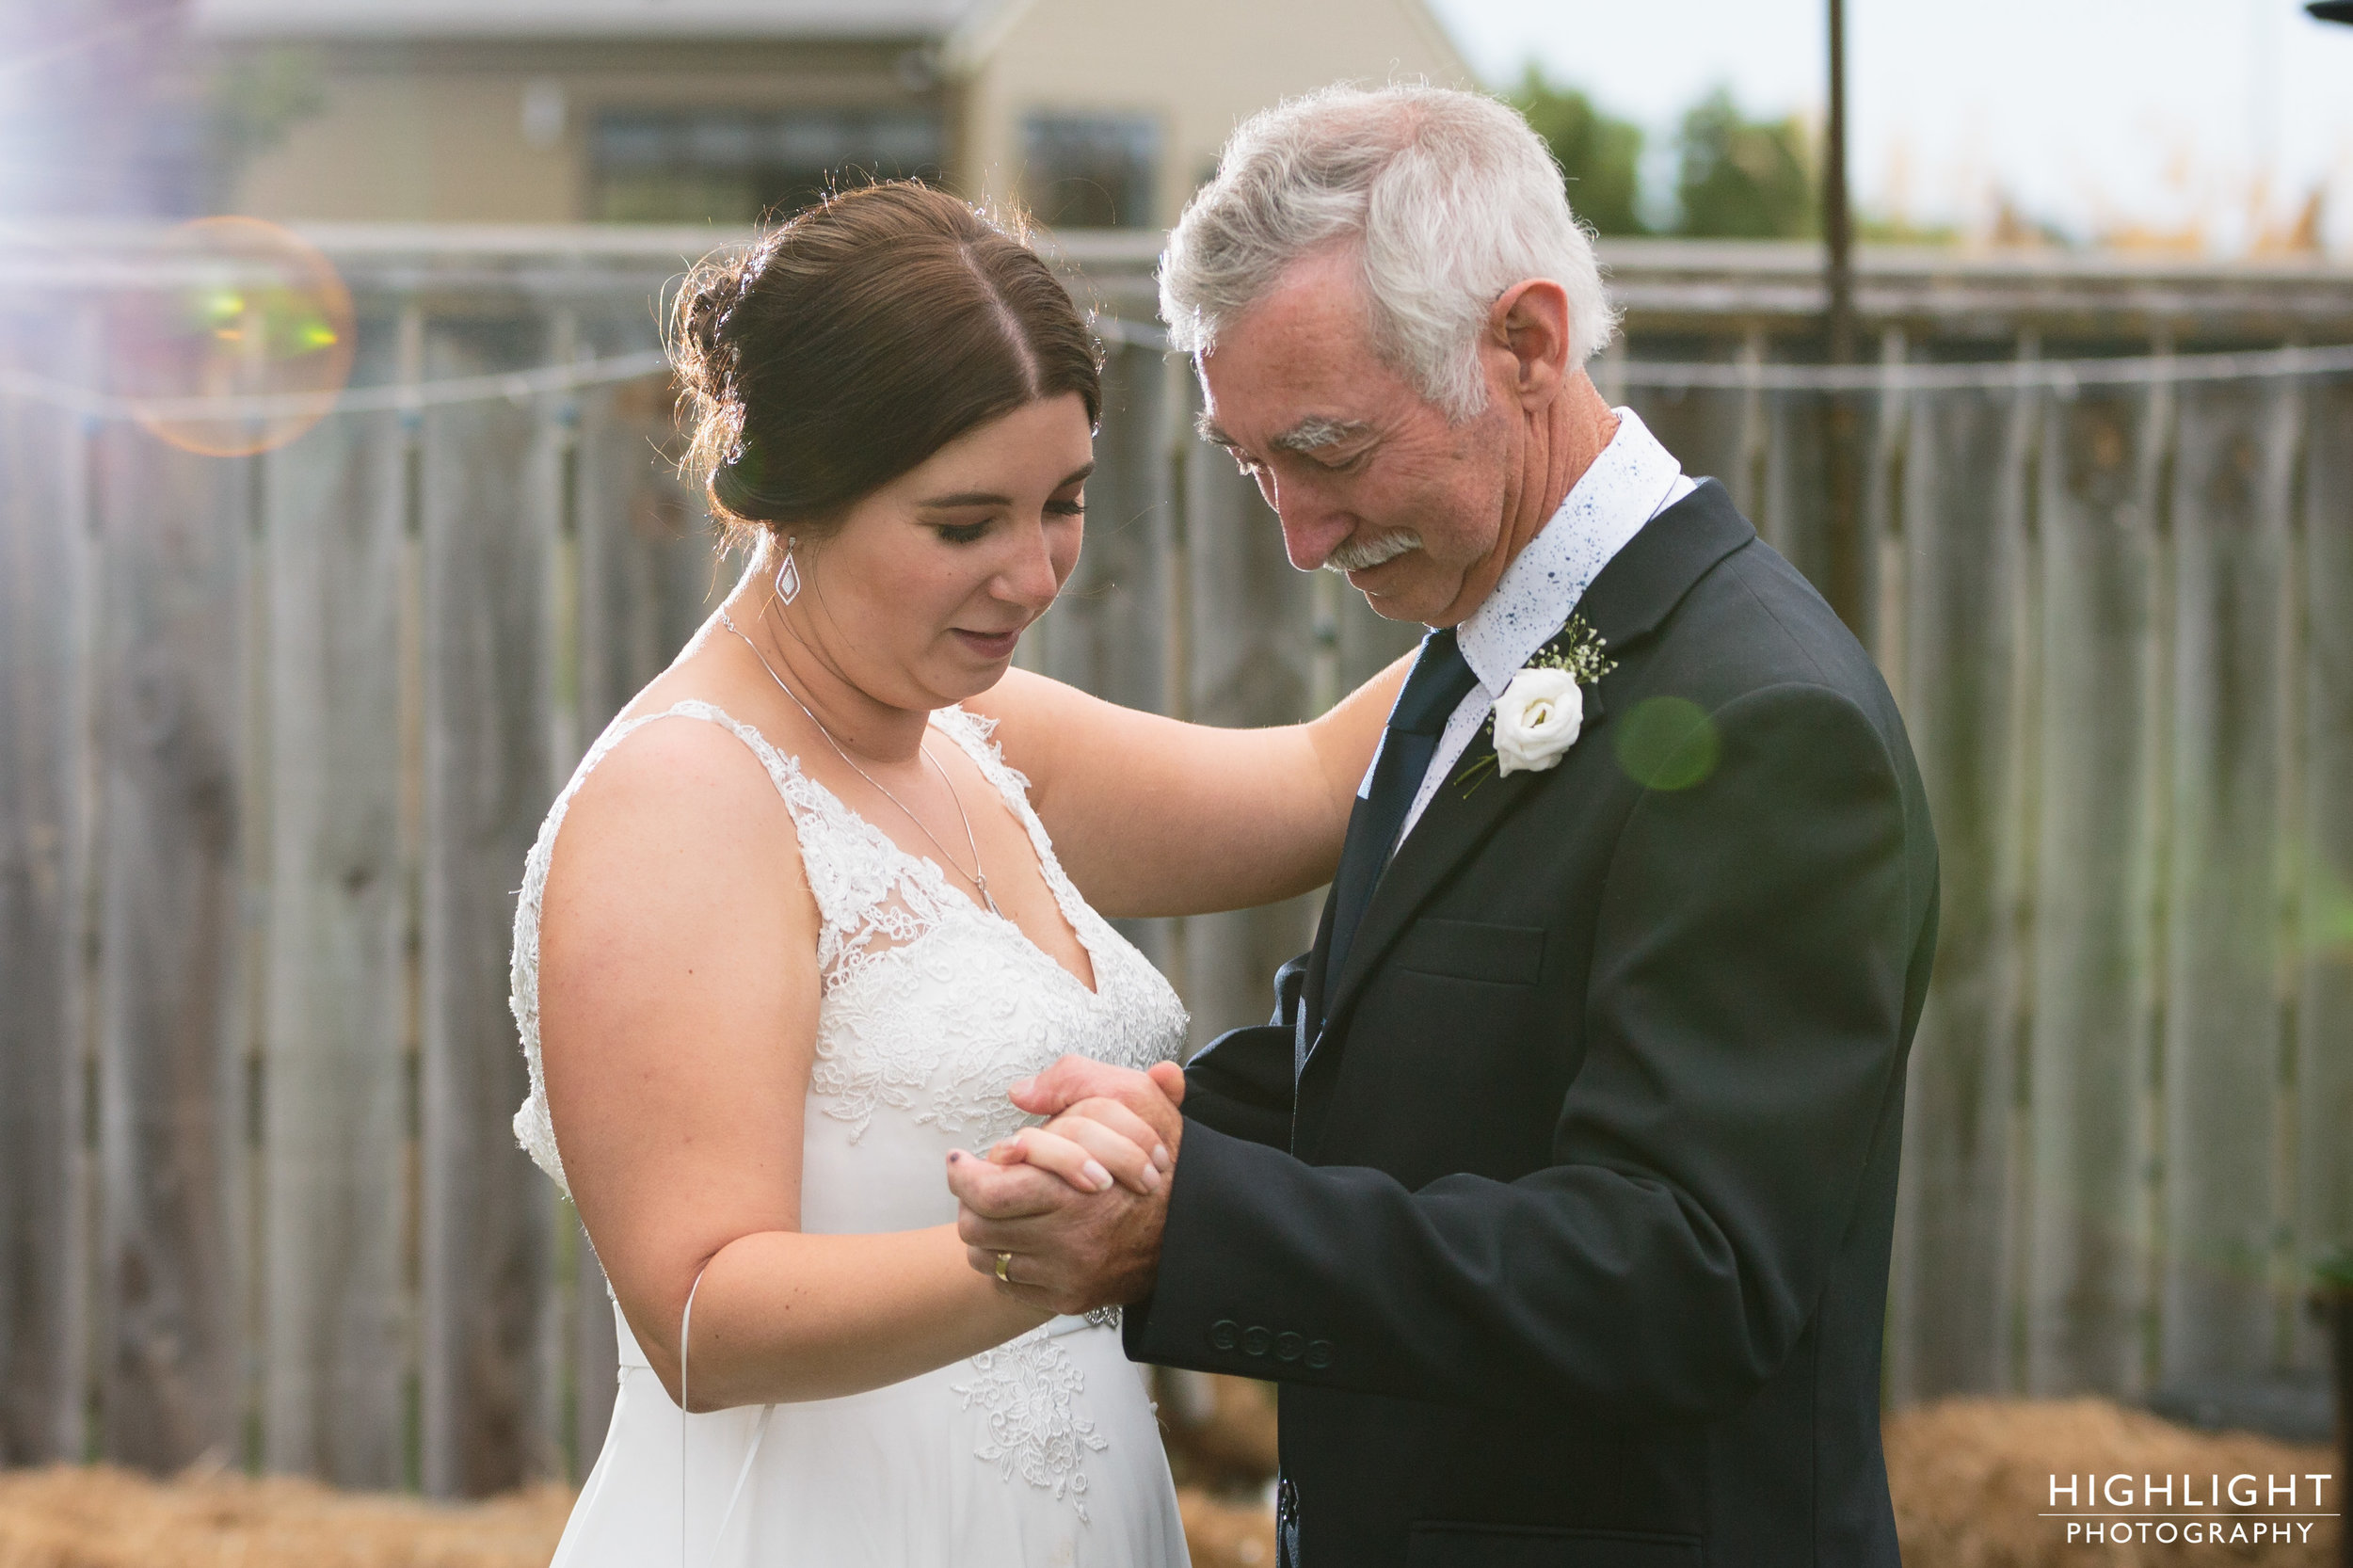 JM-2017-Highlight-wedding-photography-palmerston-north-new-zealand-217.jpg